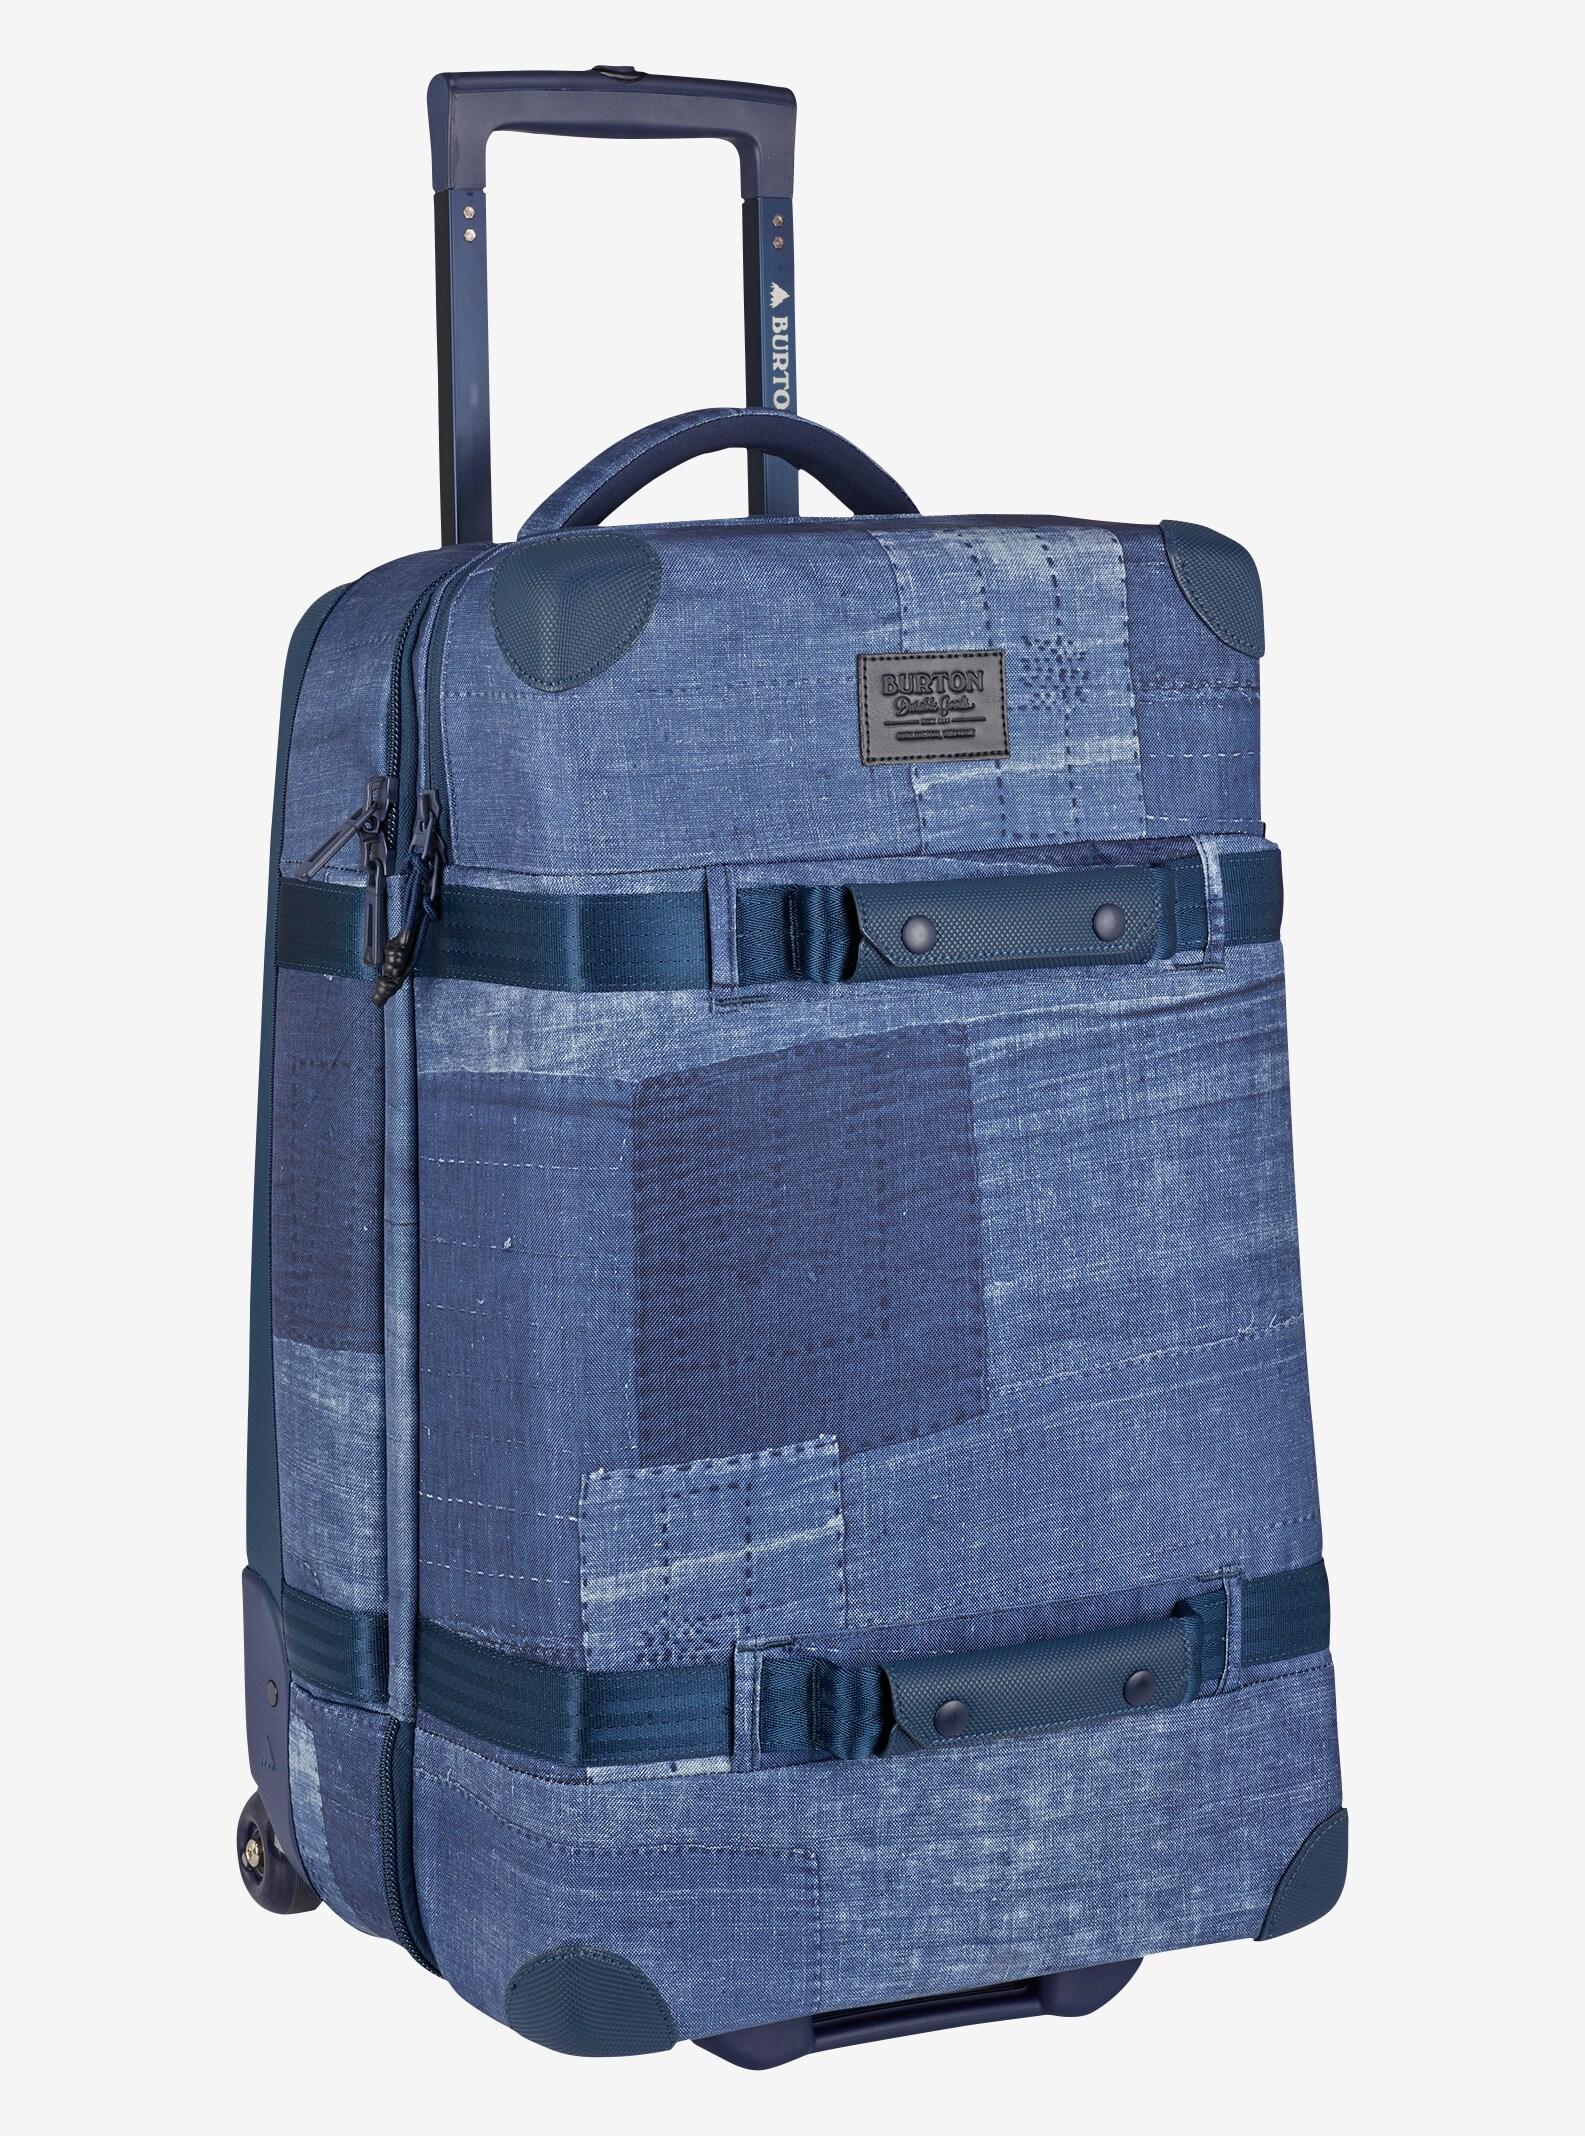 Burton Wheelie Cargo Travel Bag shown in Indiohobo Print